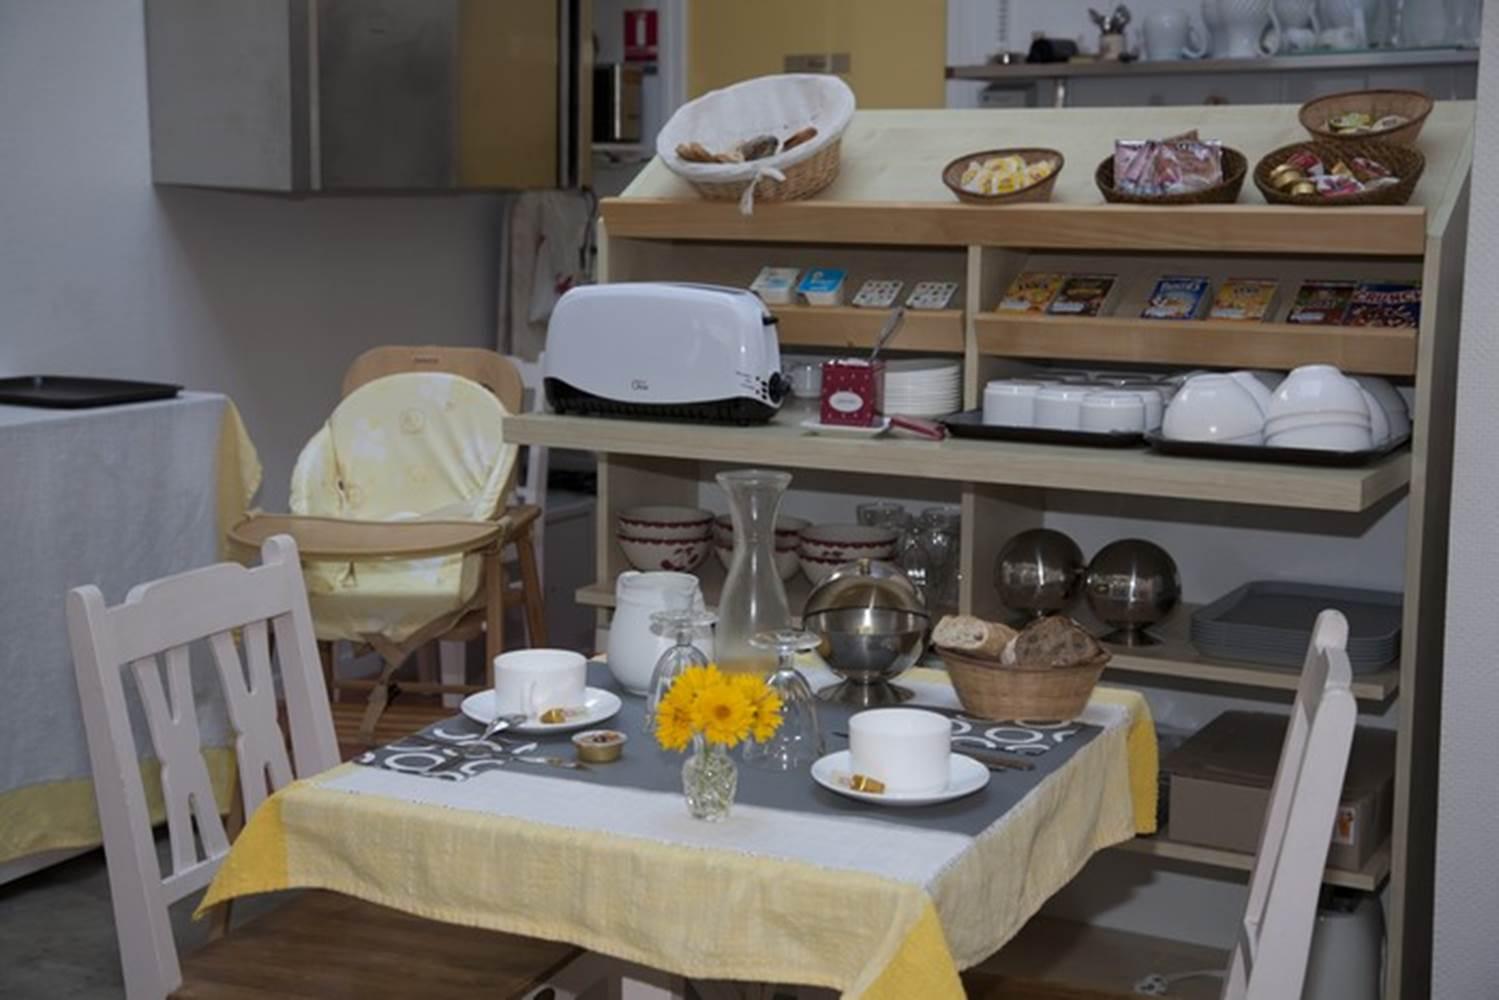 AR PEOC'H - Salle du petit-déjeuner - Morbihan - Bretagne Sud © MATHURIN